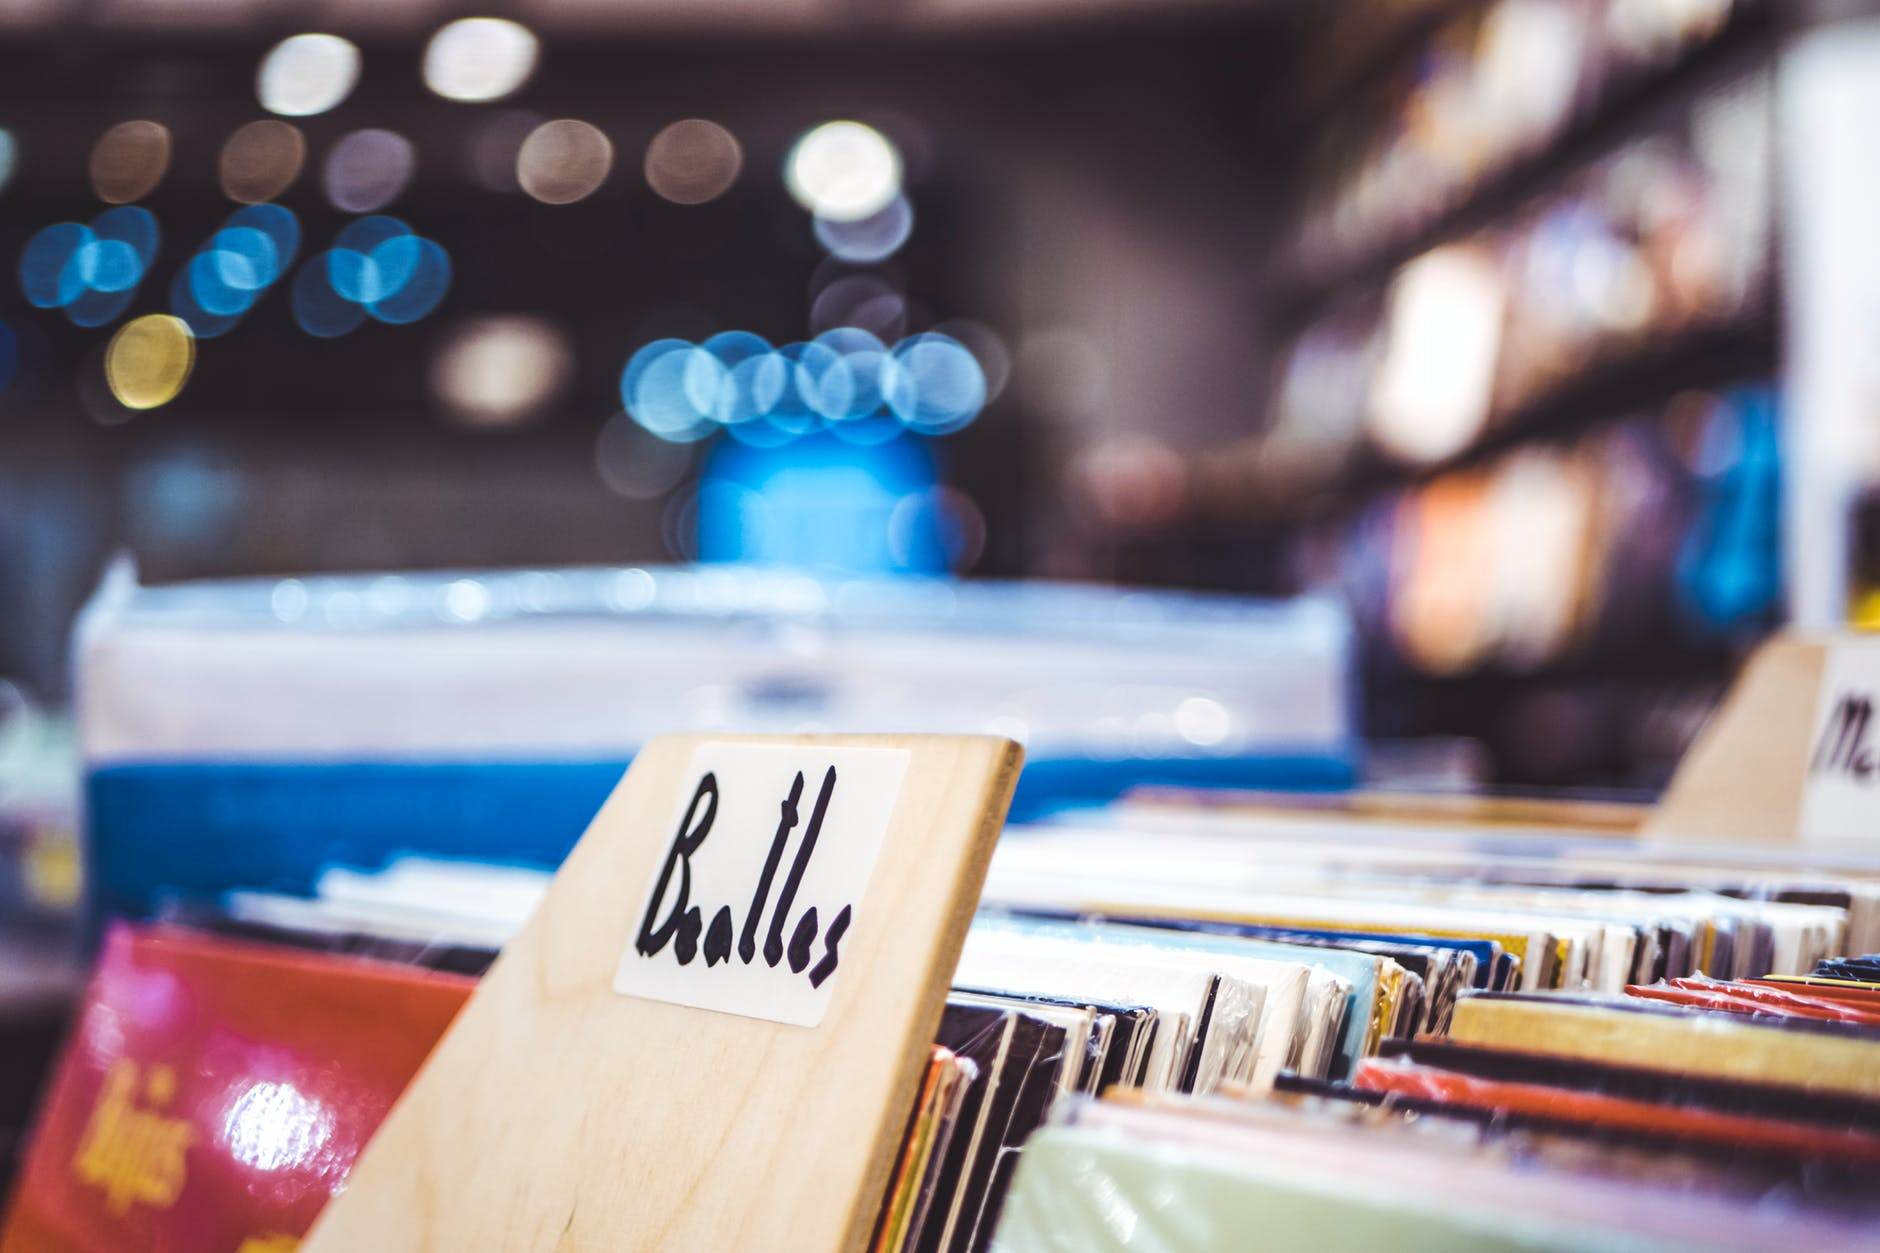 beatles vinyls